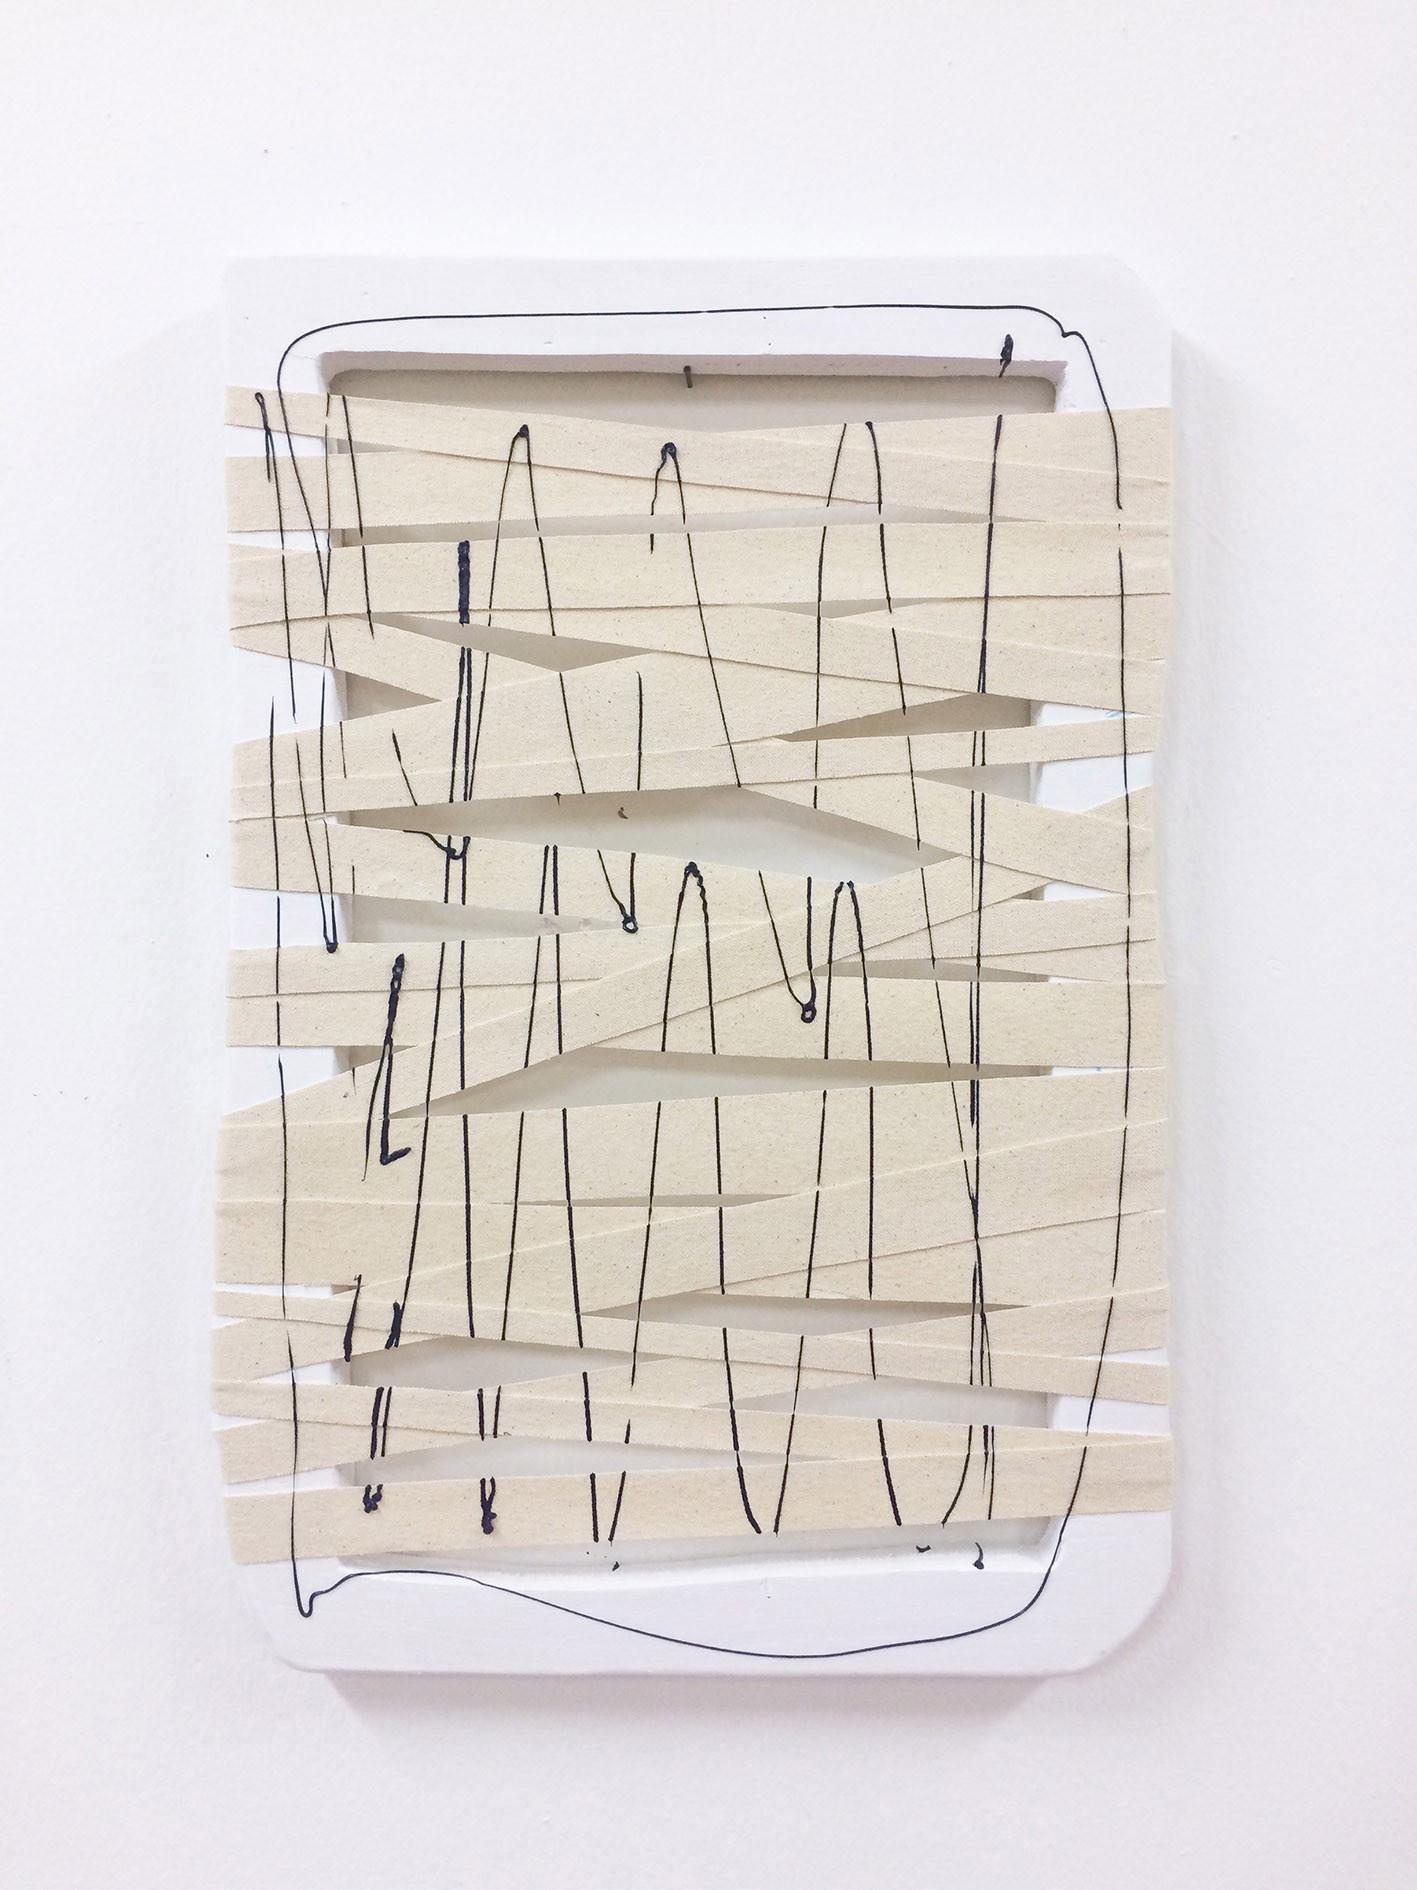 Giro, 2017. Acrylic, canvas and wood. 59 x 40 cm.